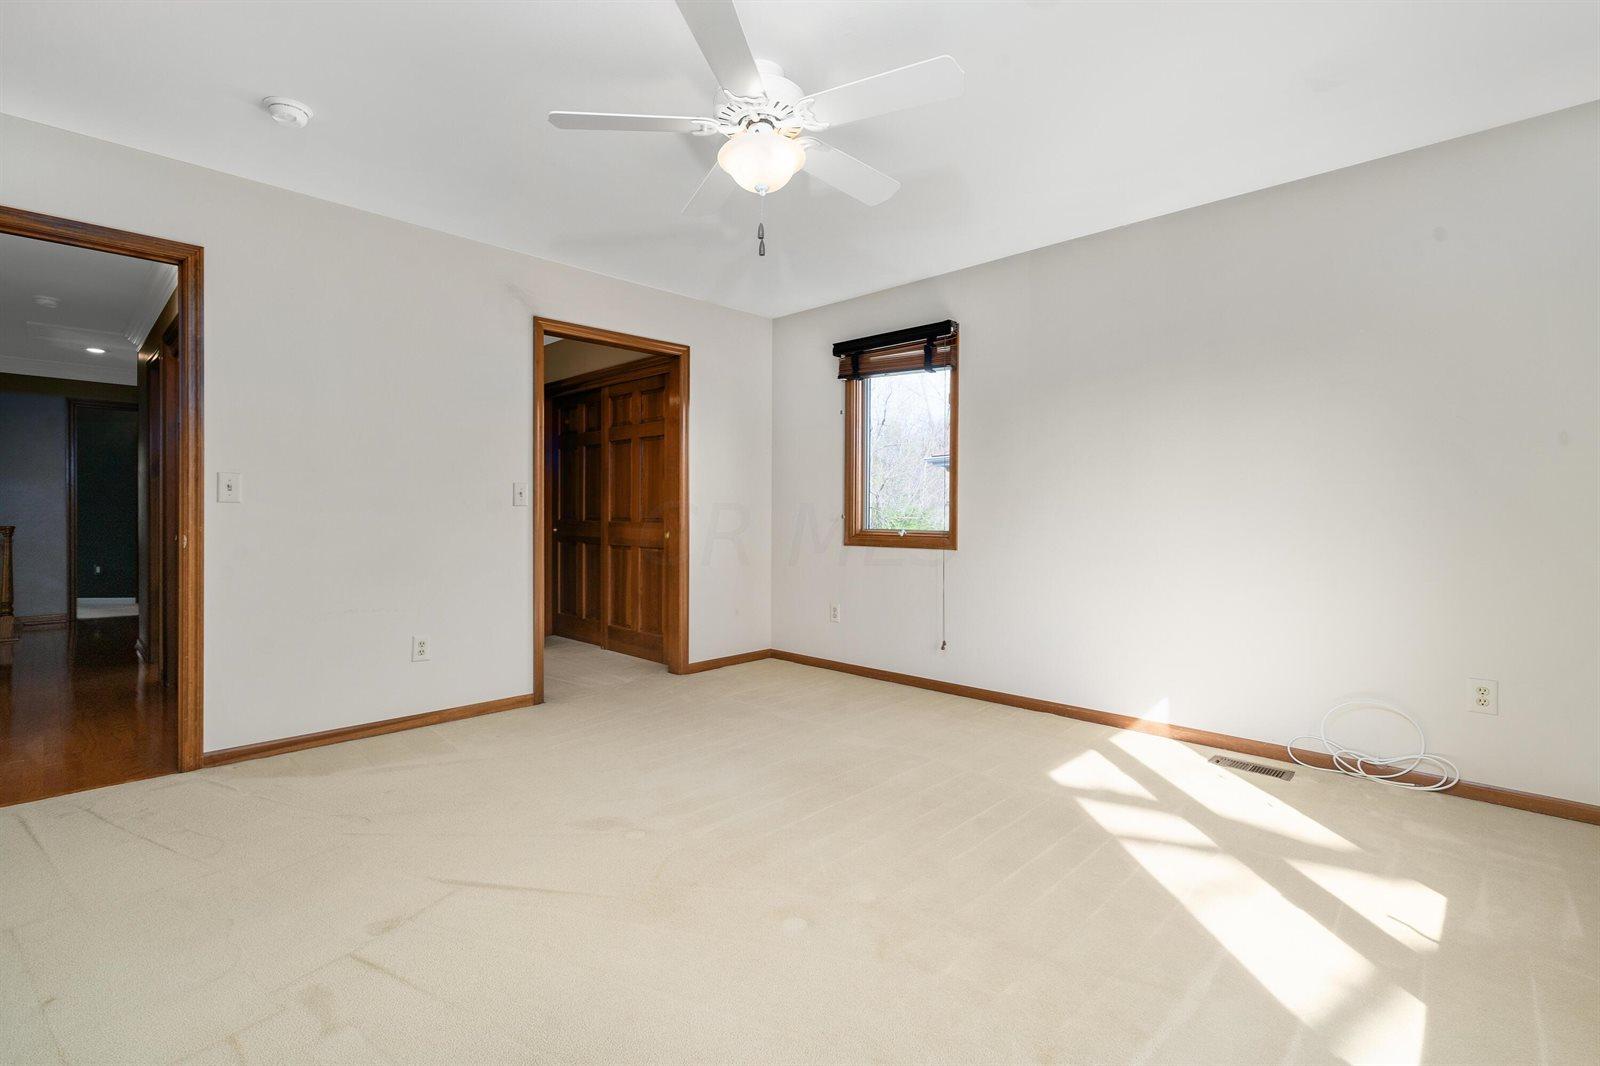 6845 Ravine Circle, Worthington, OH 43085